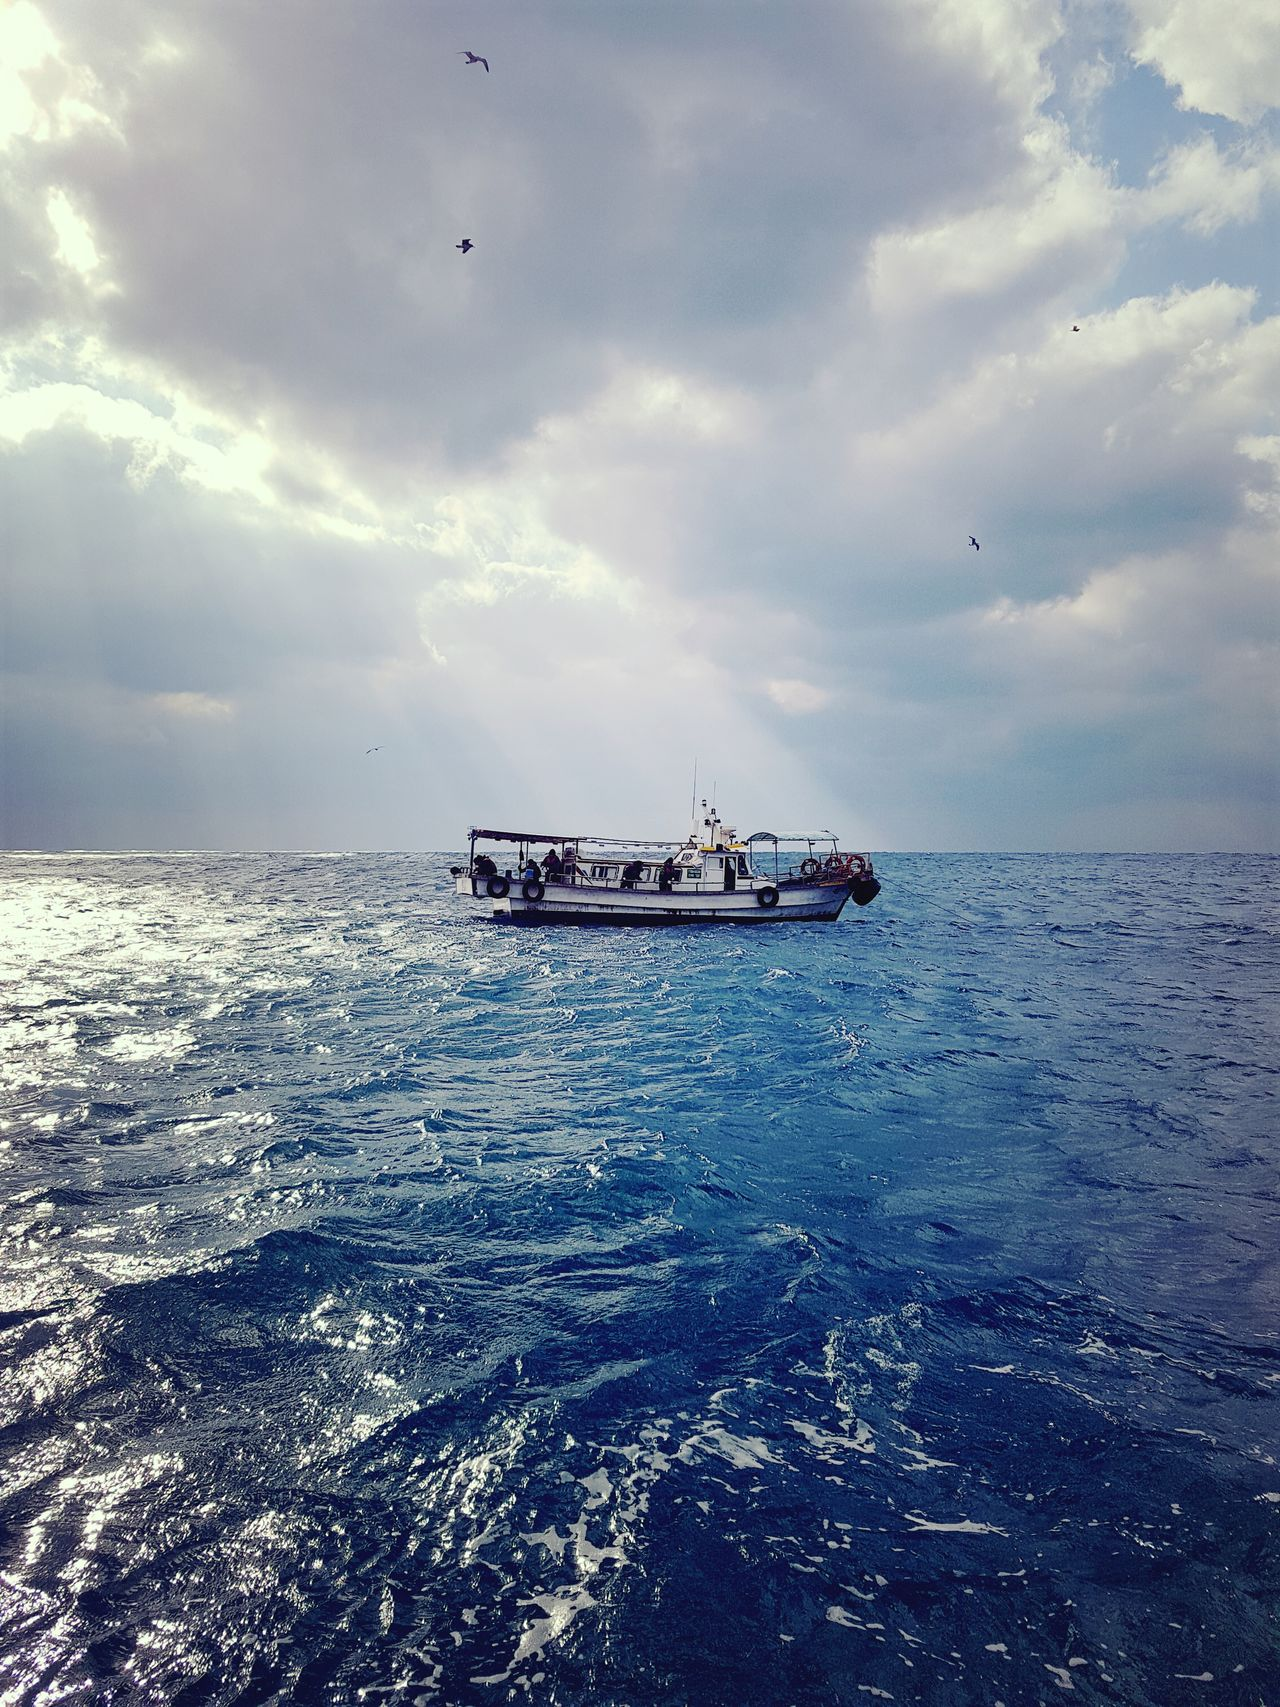 Sailing fishing boat in choppy sea Nautical Vessel Sunset Cloudy Sky Blue Sea Jeju Island, Korea Chagui-do Small Fishing Boat. Eyeemphotography Fishing On The Boat With Son Family Trip Blue Wave